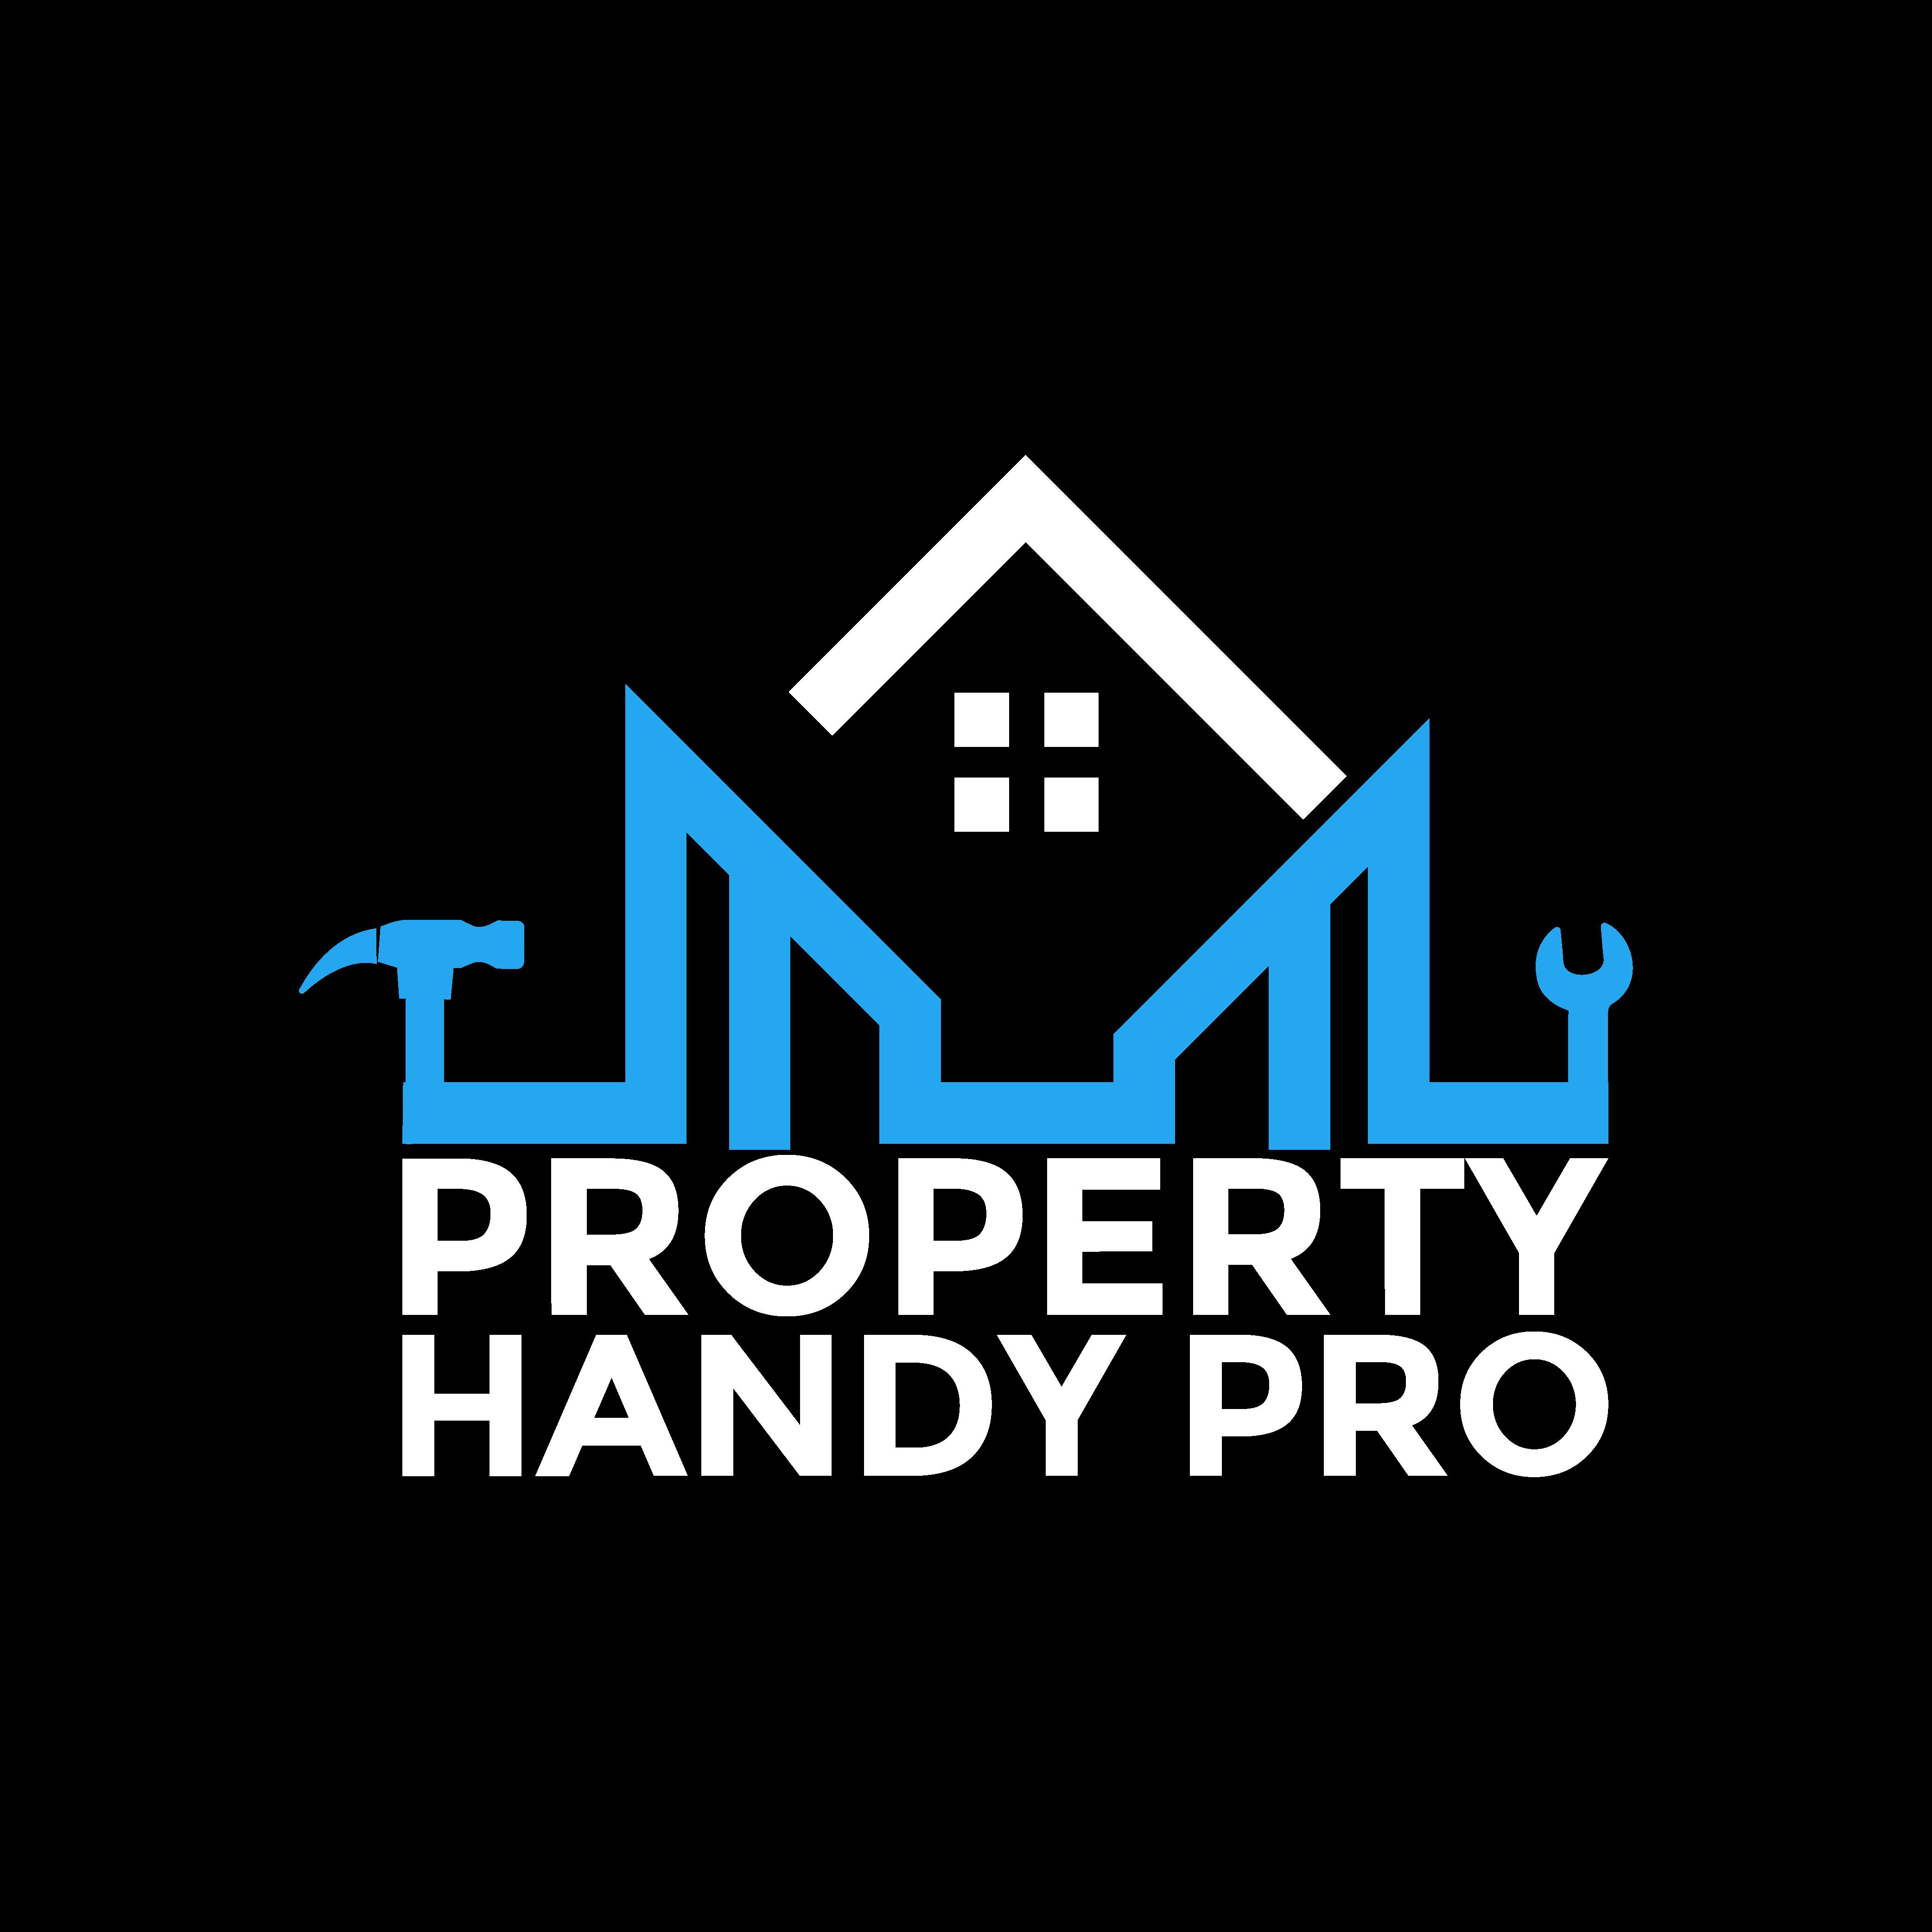 Property Handy Pro